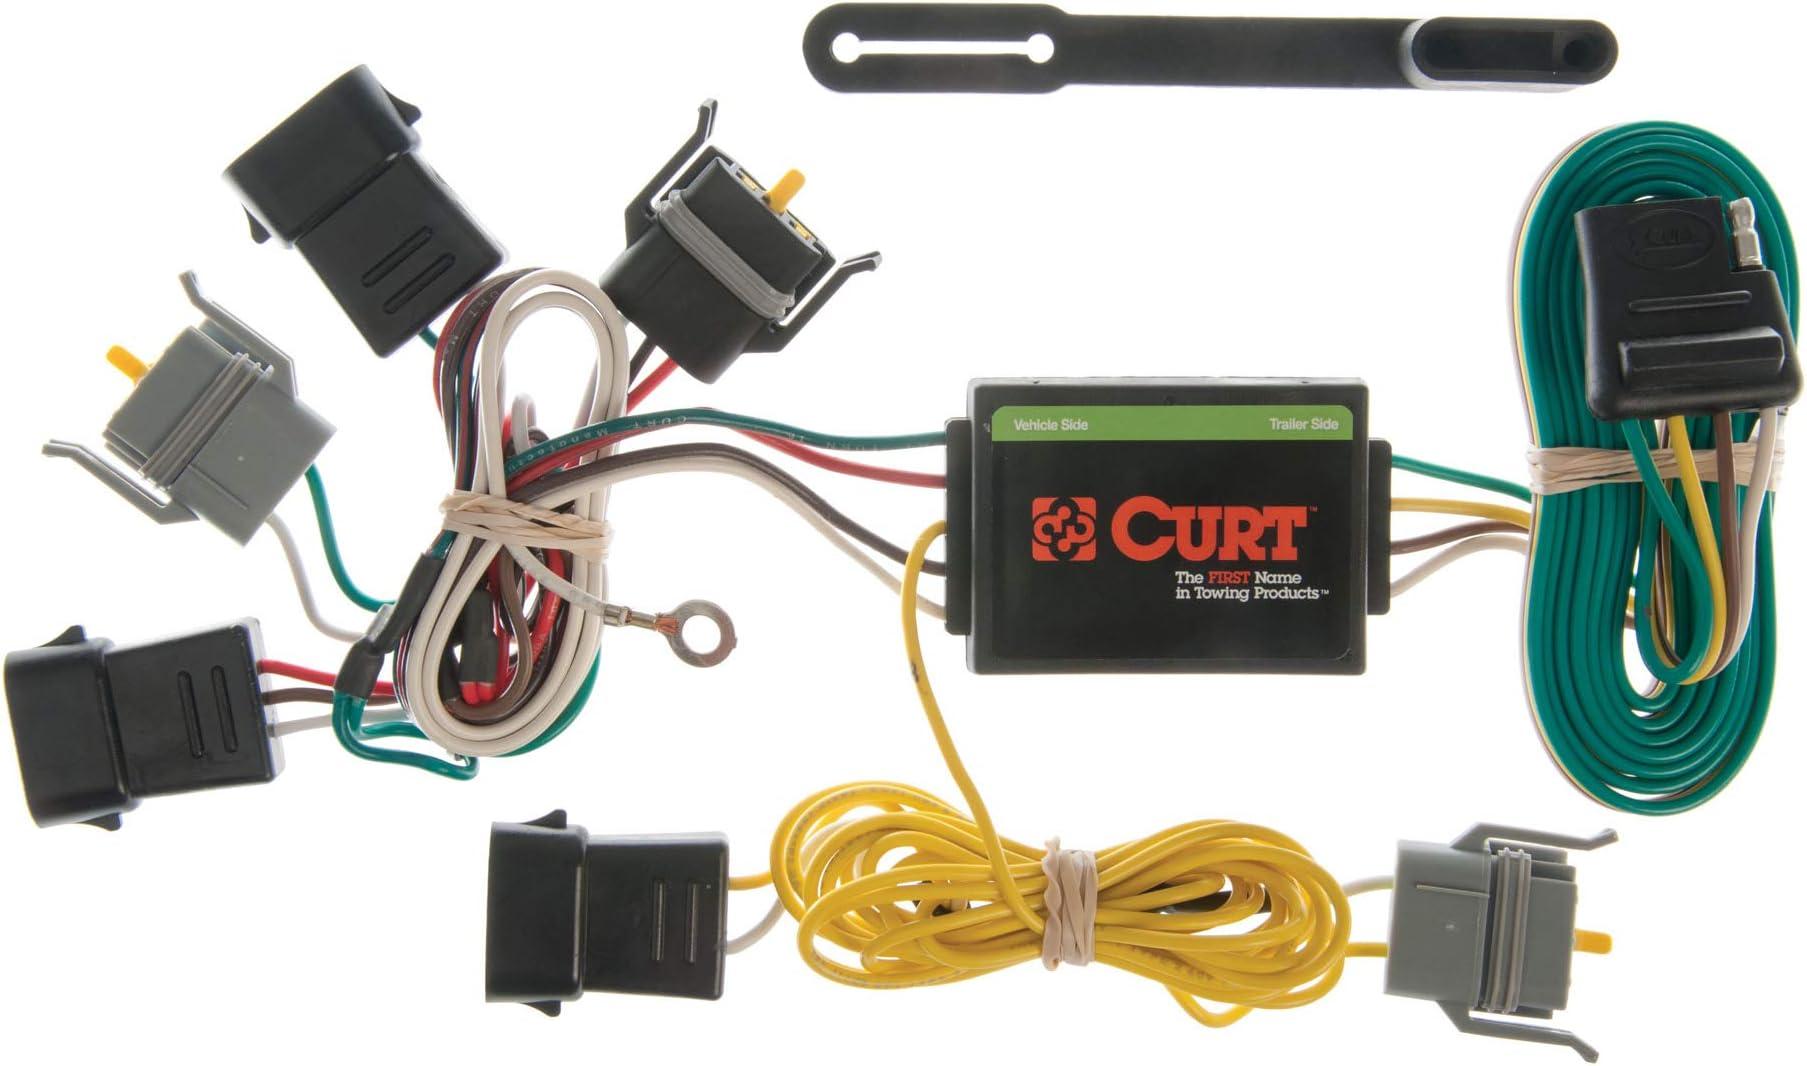 Amazon.com: CURT 55343 Vehicle-Side Custom 4-Pin Trailer Wiring Harness for  Select Ford Econoline, Escape, Mazda Tribute, Mercury Sable: AutomotiveAmazon.com